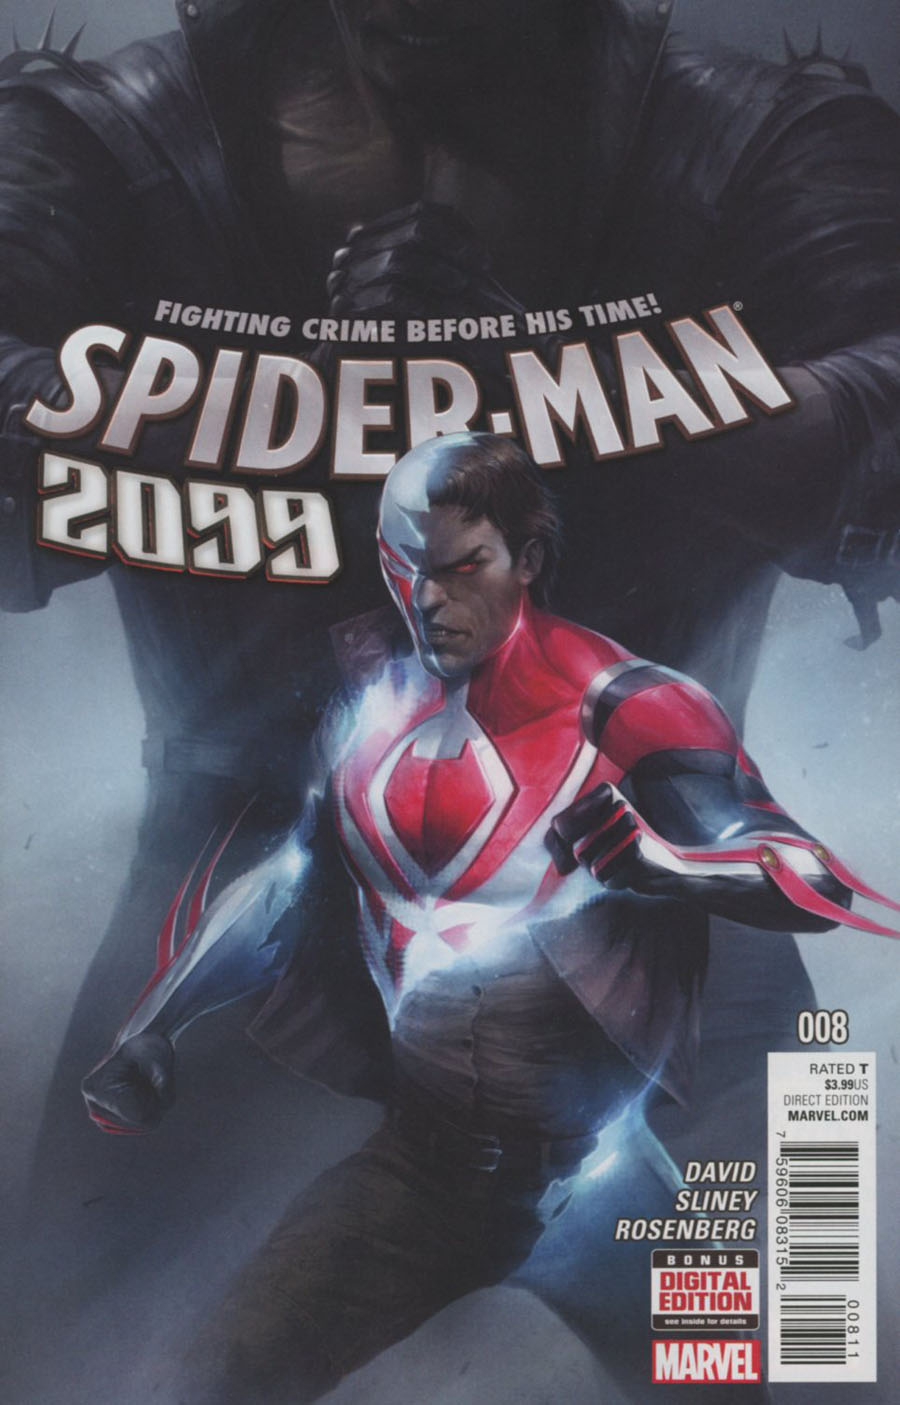 Spider-Man 2099 Vol 3 #8 Cover A Regular Francesco Mattina Cover